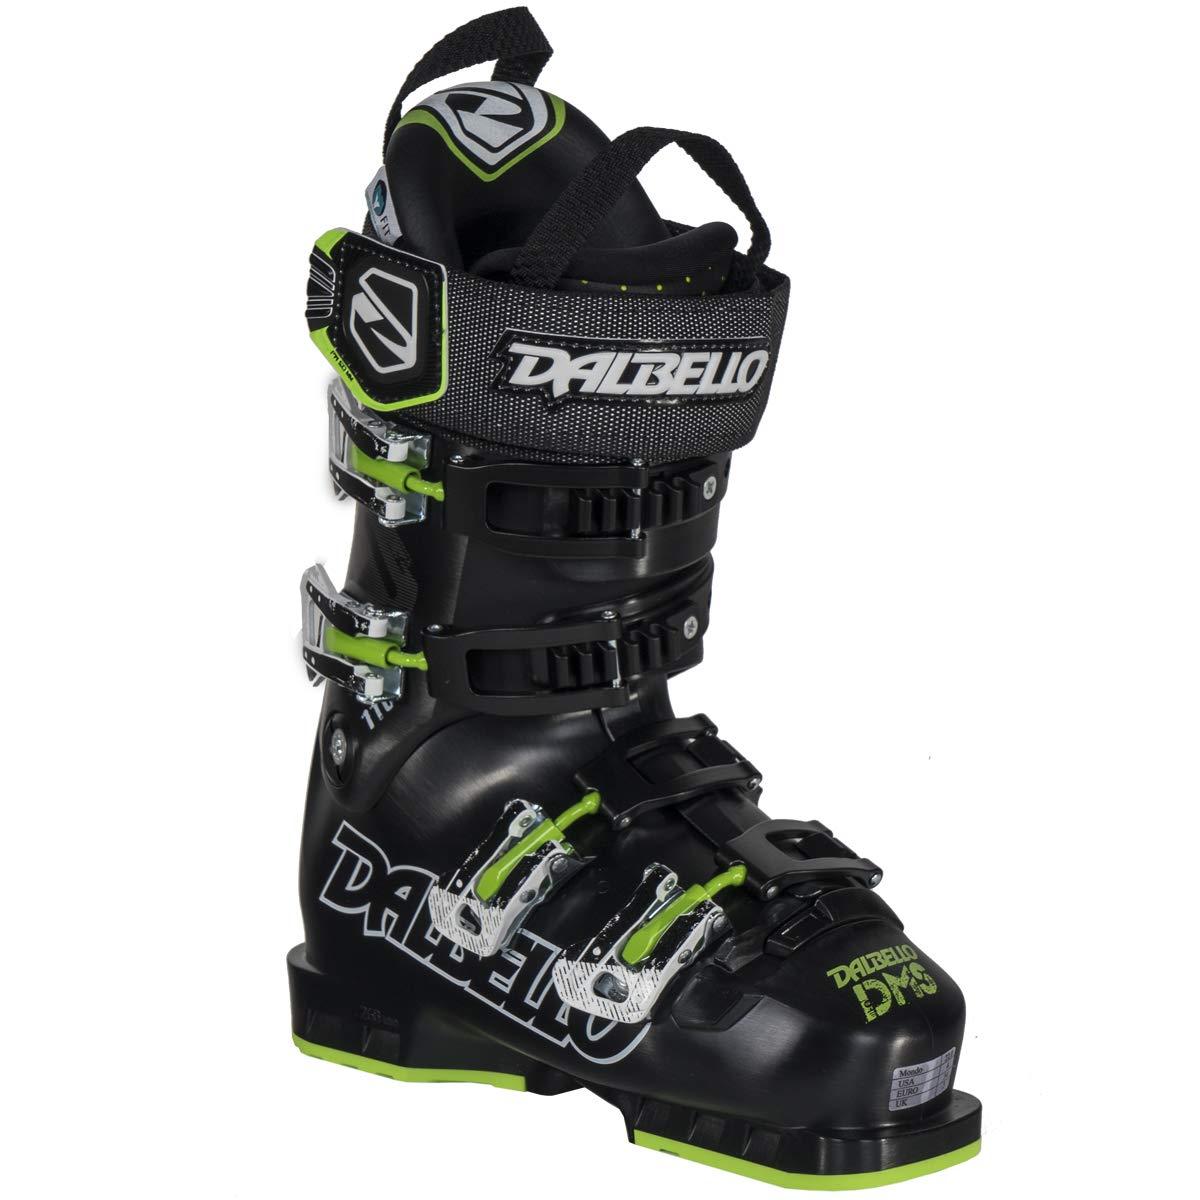 Dalbello - DMS 110 ブーツ - メンズ